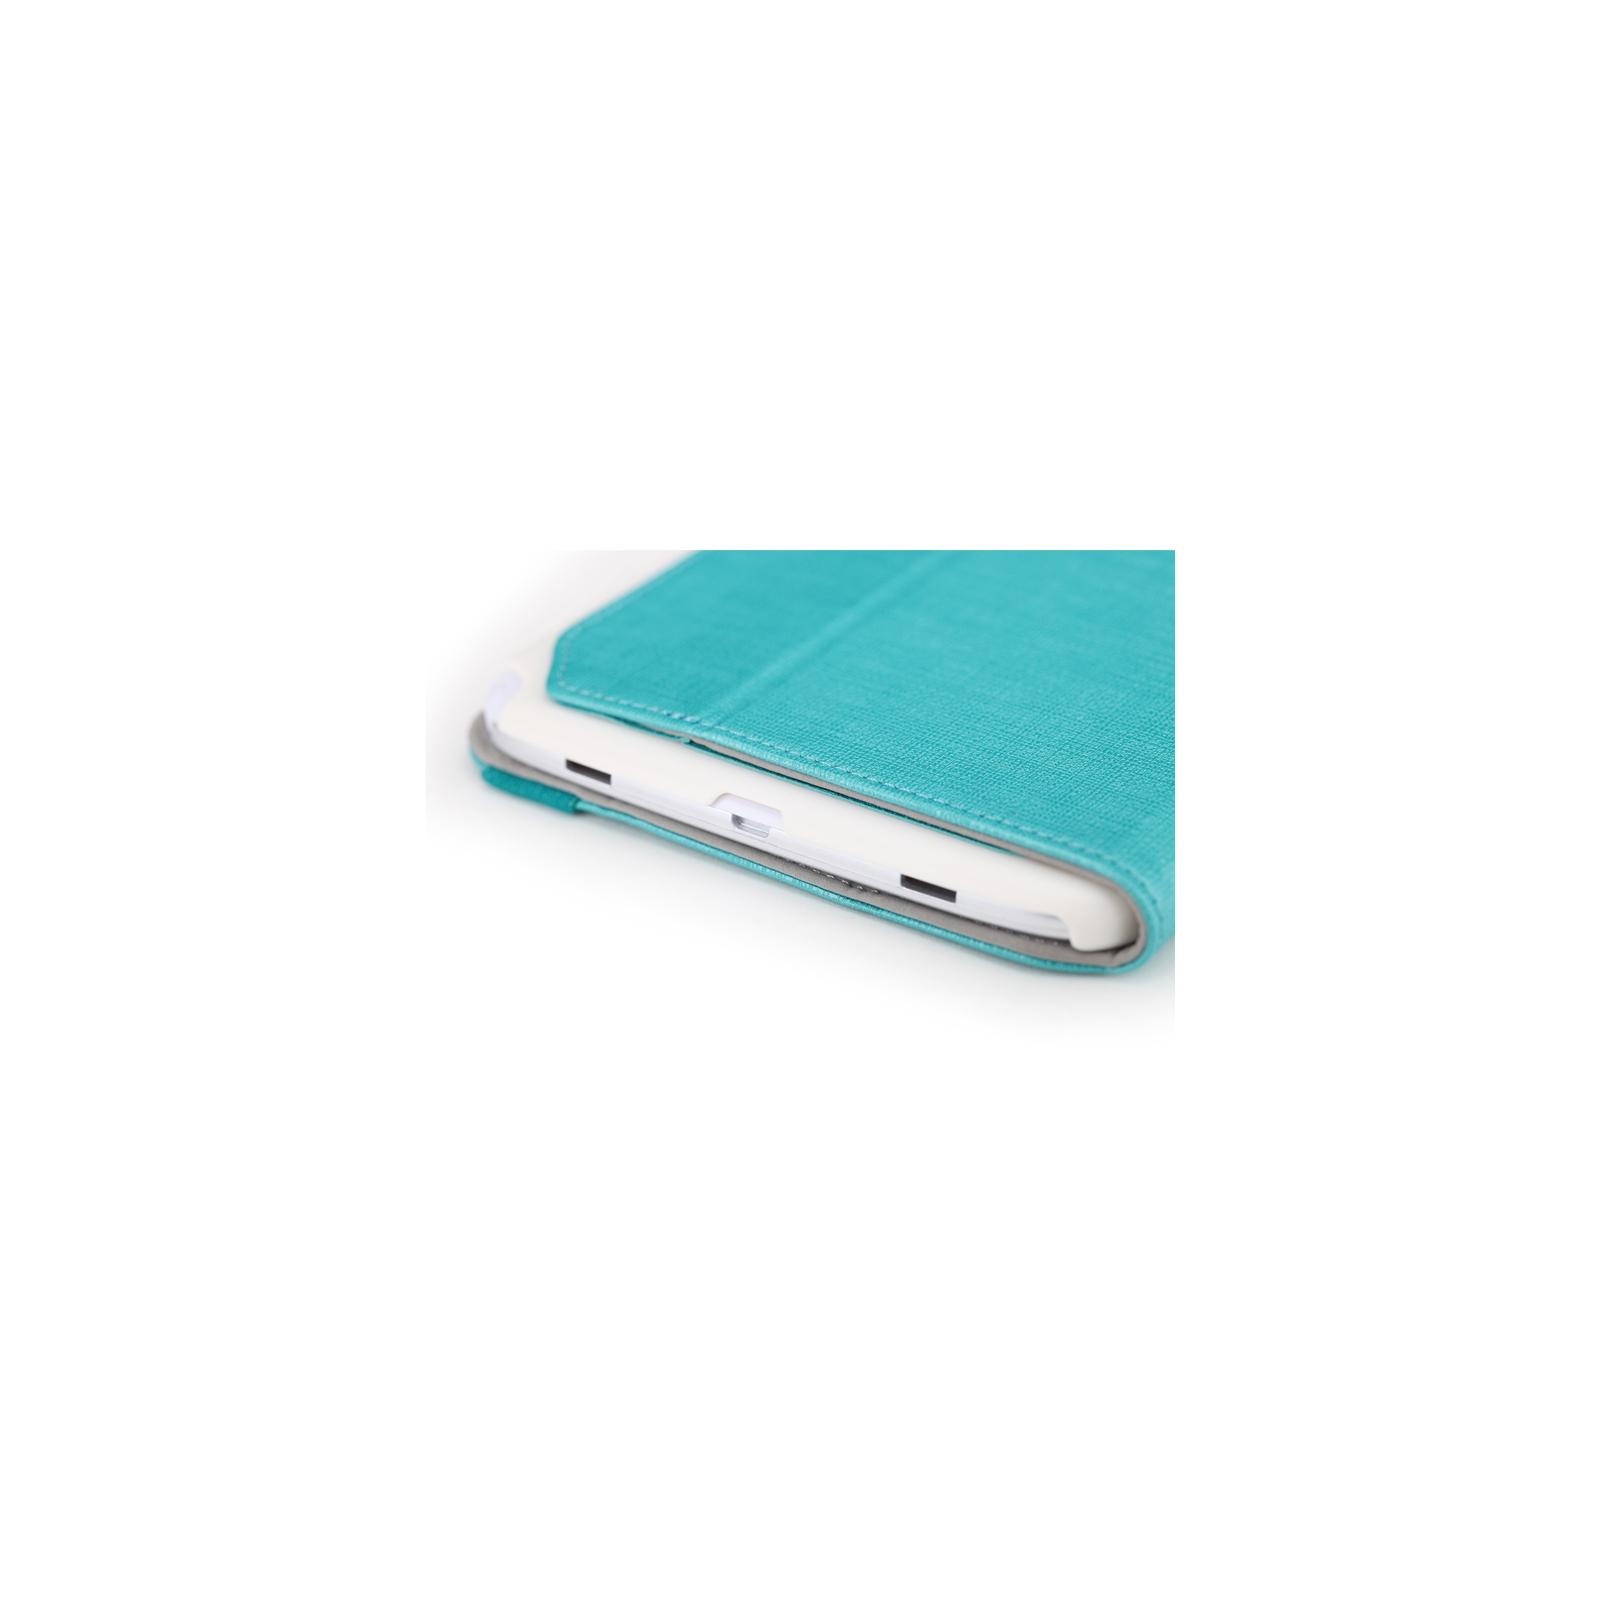 "Чехол для планшета Rock 8"" Rock Samsung Note 8.0 N5100 flexible series green (6950290627965) изображение 5"